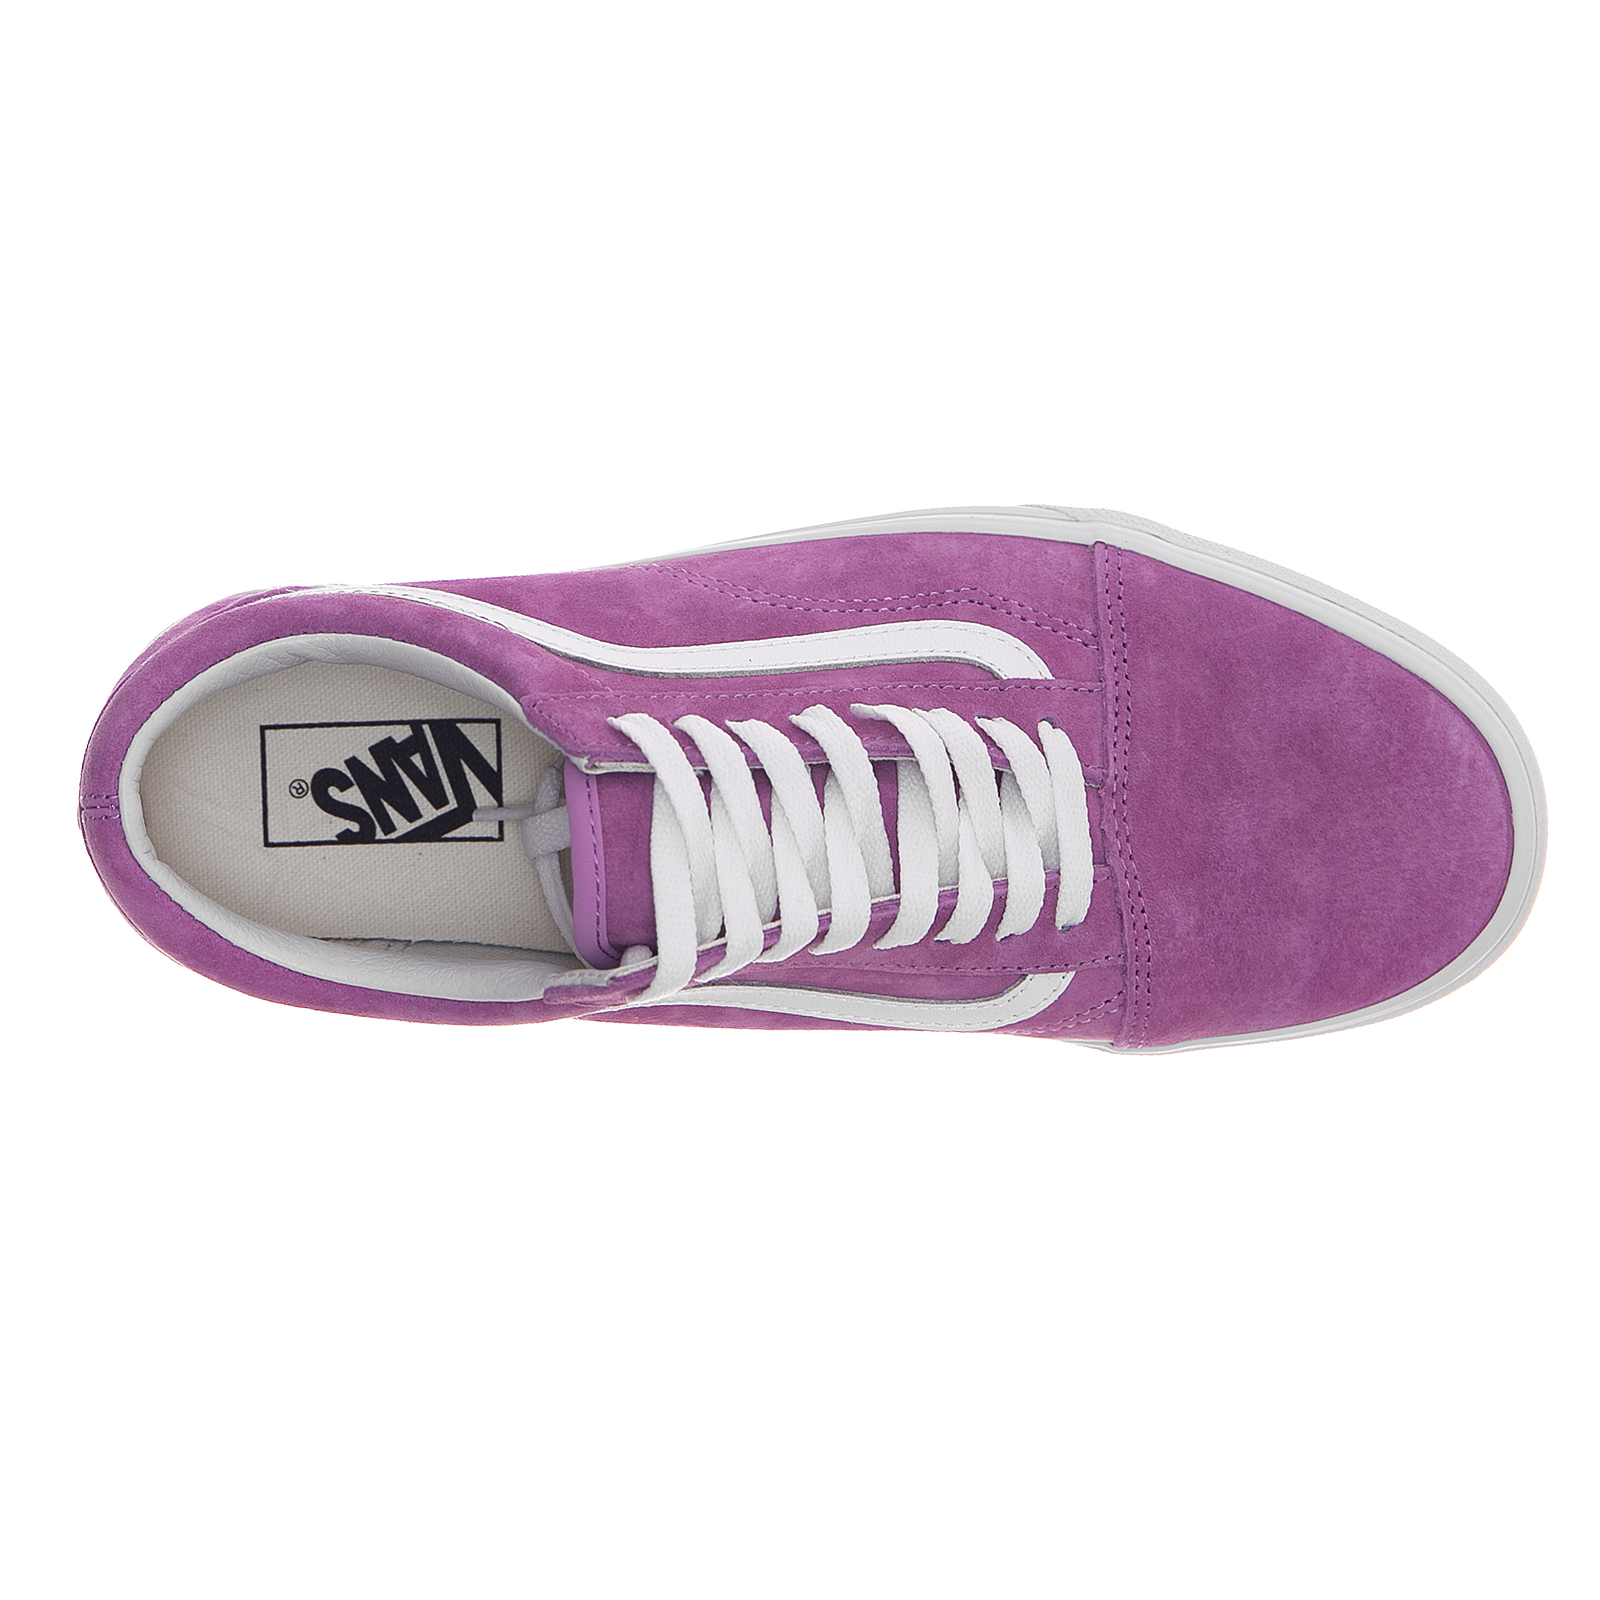 Vans Vans Vans scarpe da ginnastica Ua Old Skool (Pig Suede) viola Ttue bianca Viola | Nuovo Prodotto  7f8093